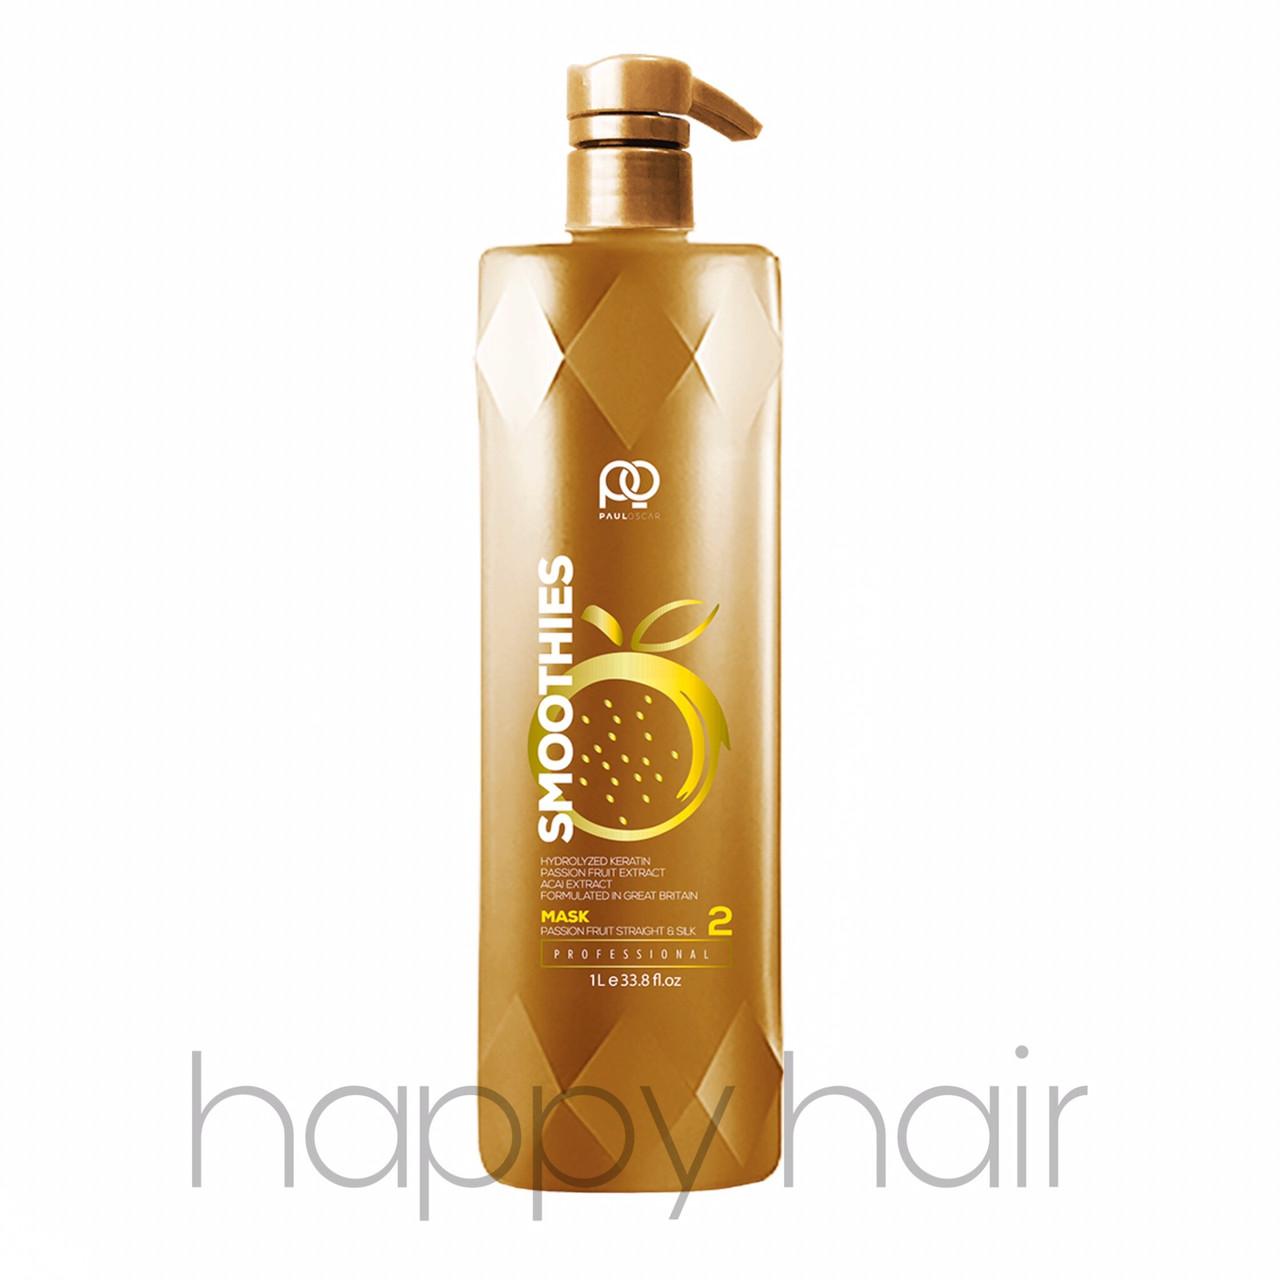 Paul Oscar Smoothies Passion Fruit Smooth & Silky Кератин для волосся 1000 мл